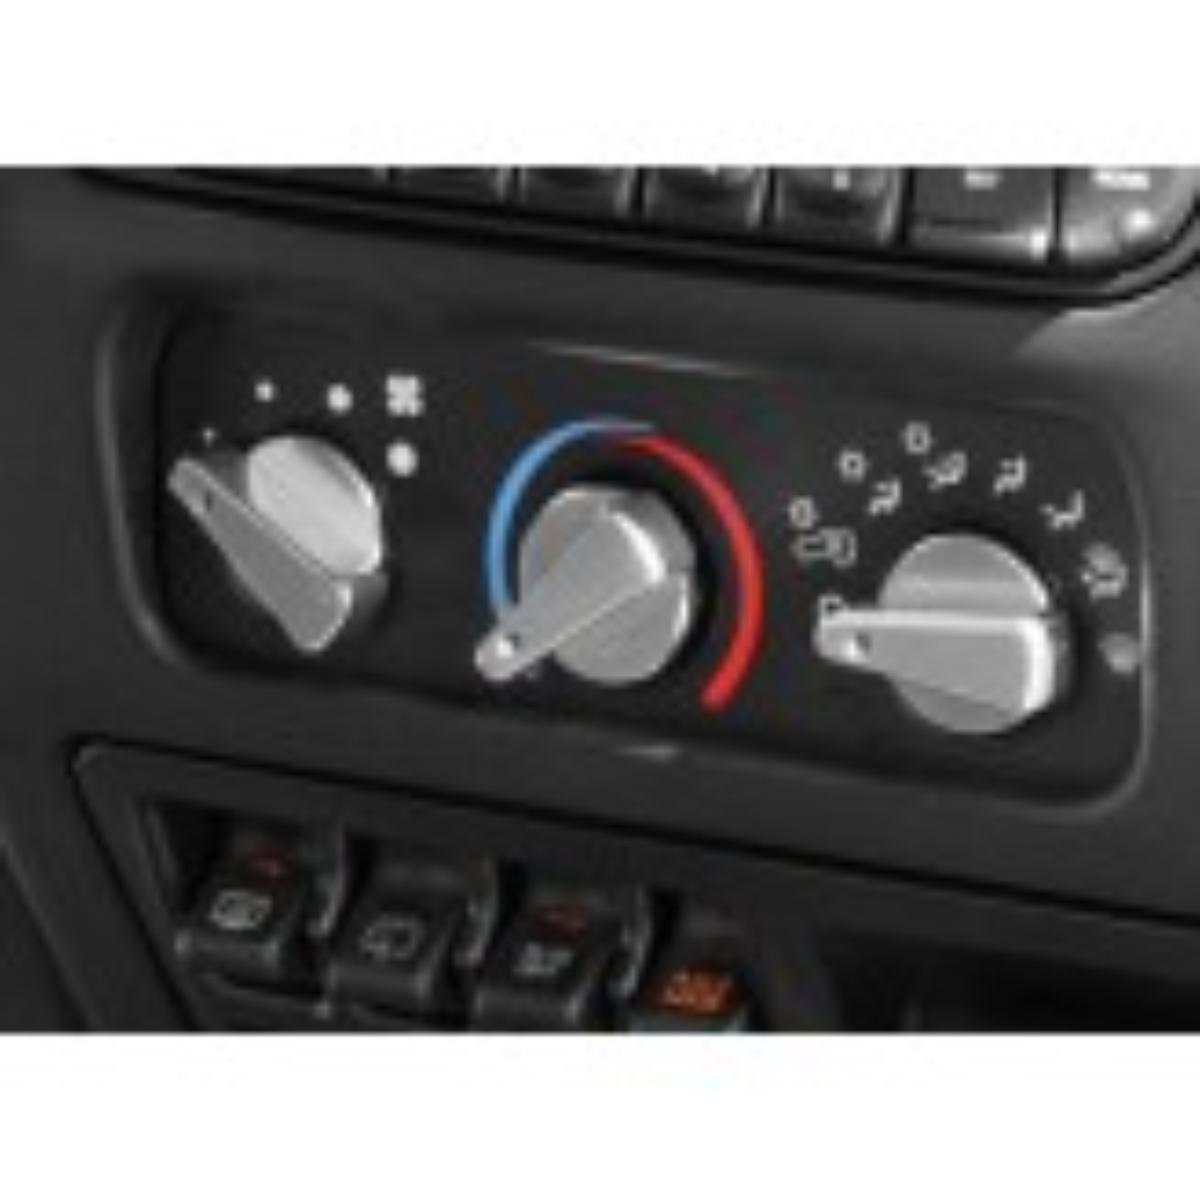 3 Piece Alu Climate Control Knob Set, Blue; 99-06 Jeep Wrangler TJ